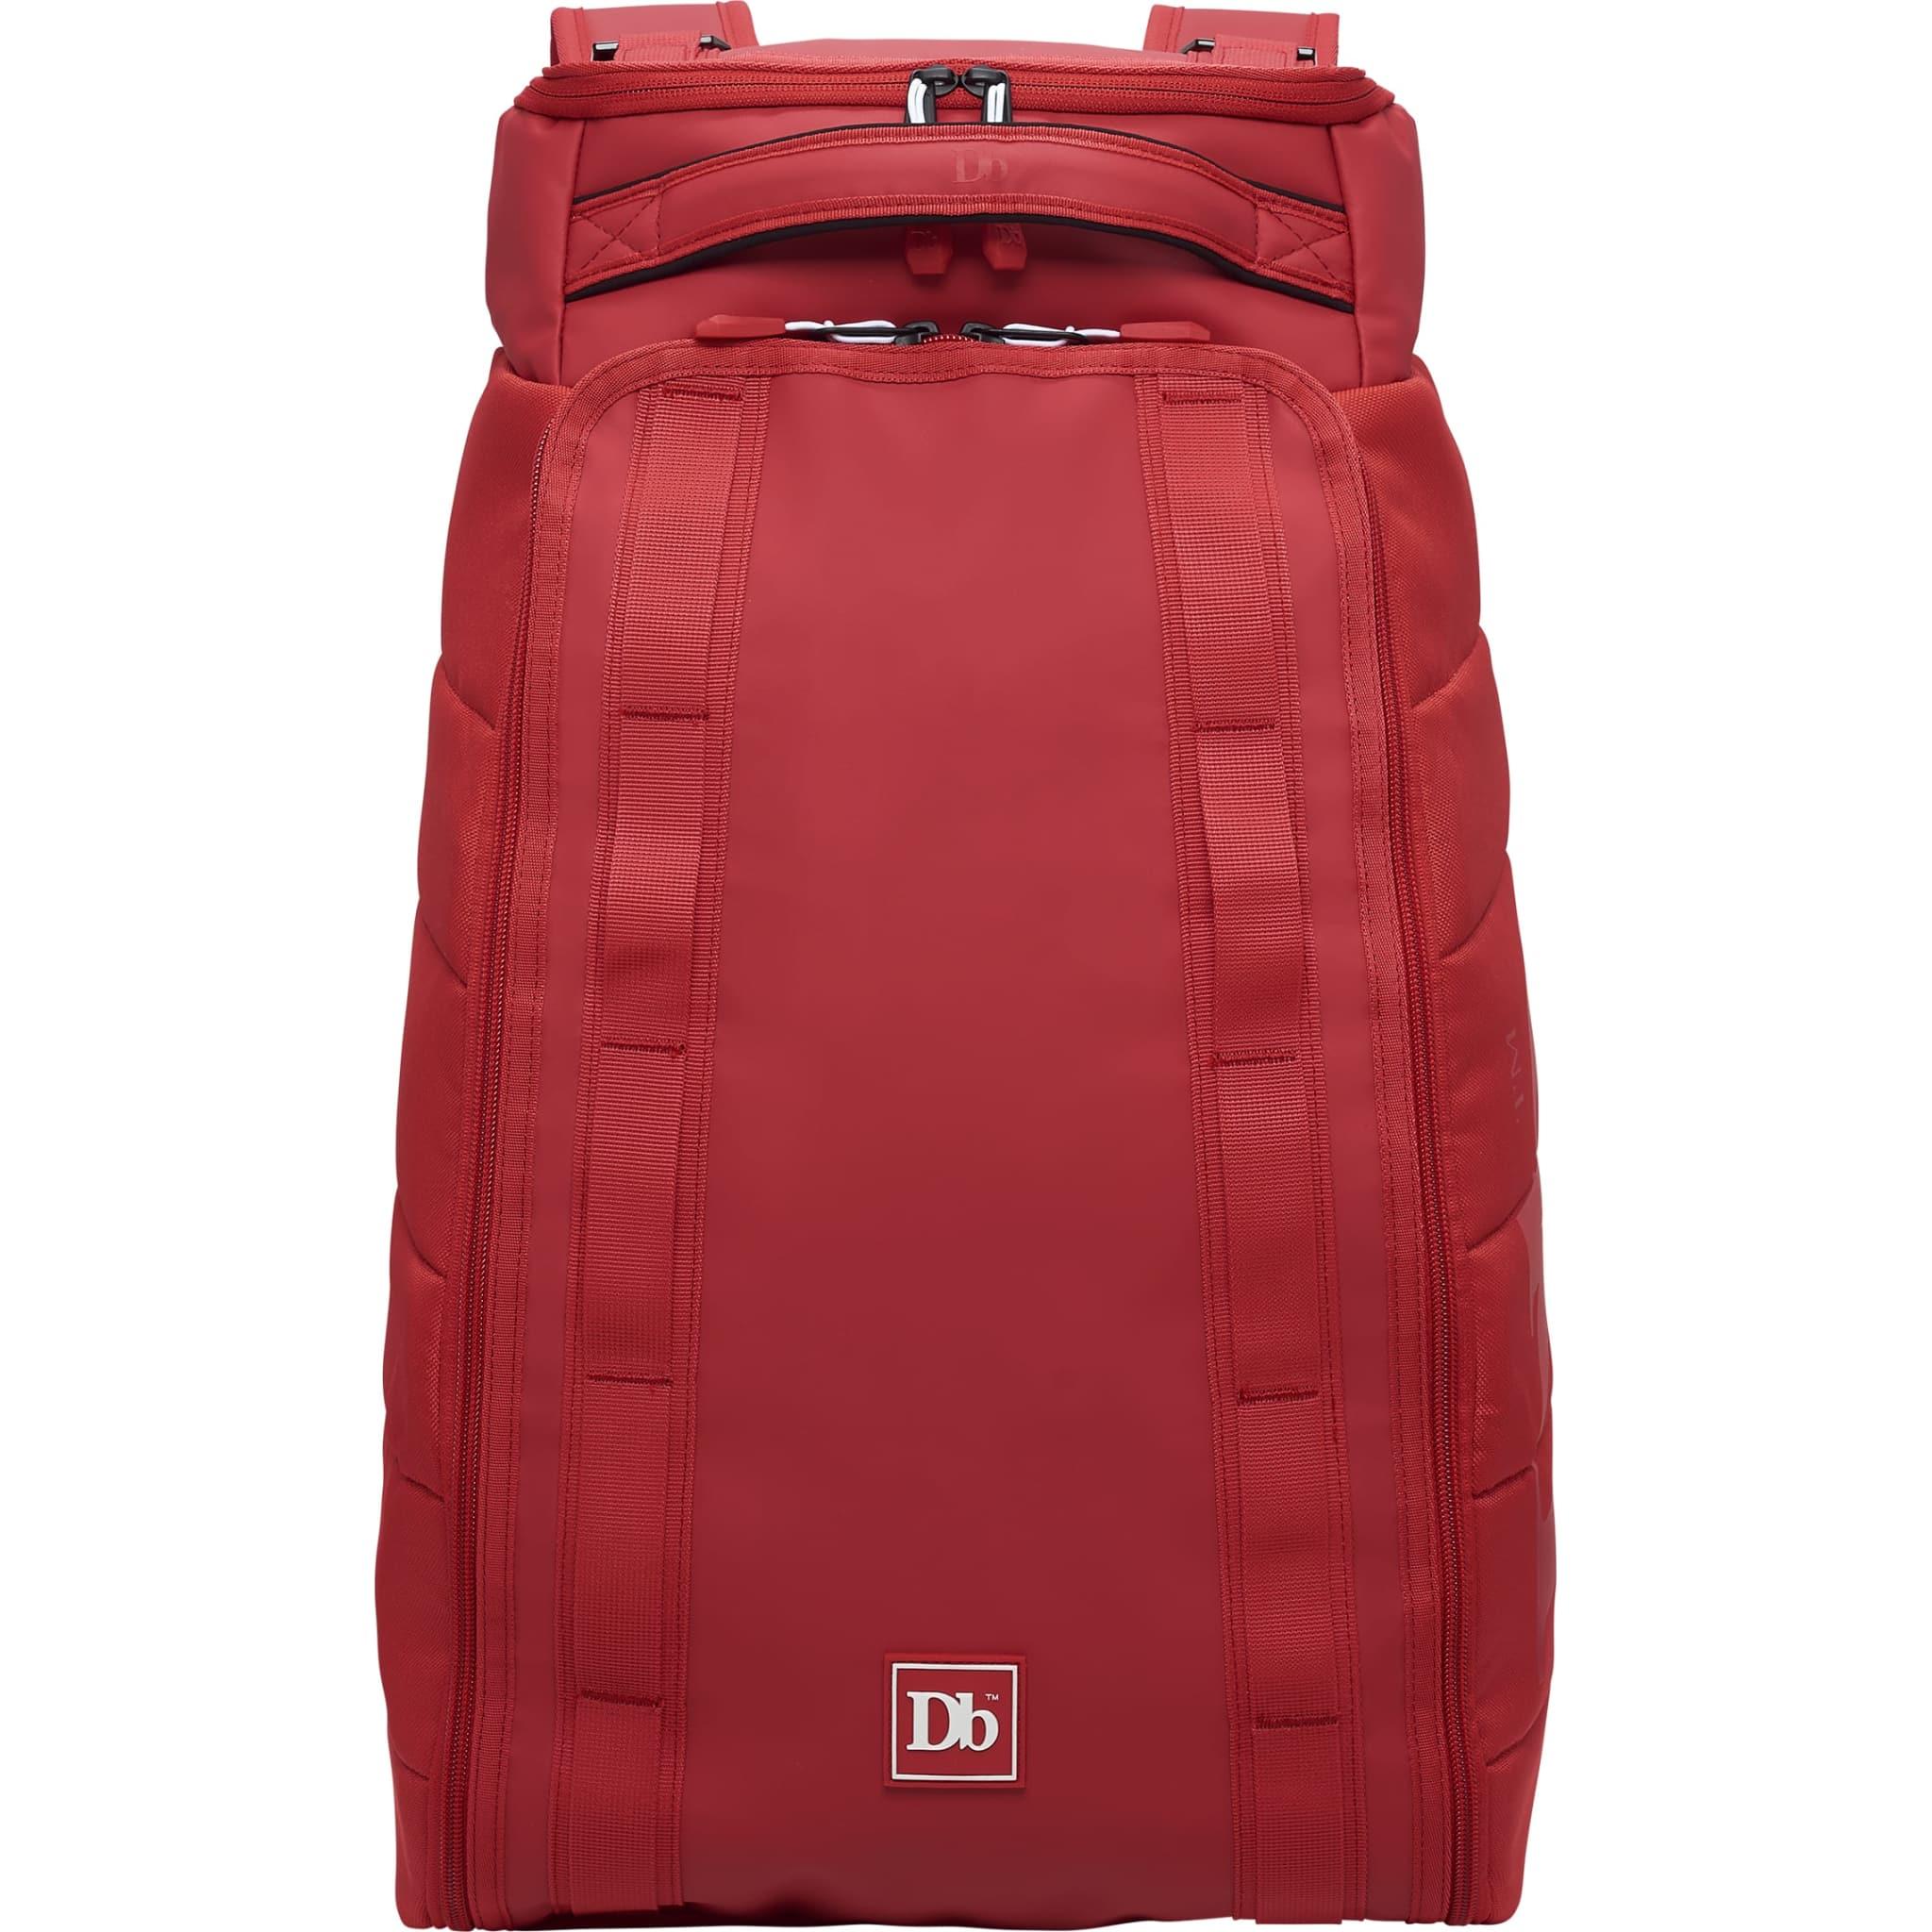 30 liter bagasjelykke!